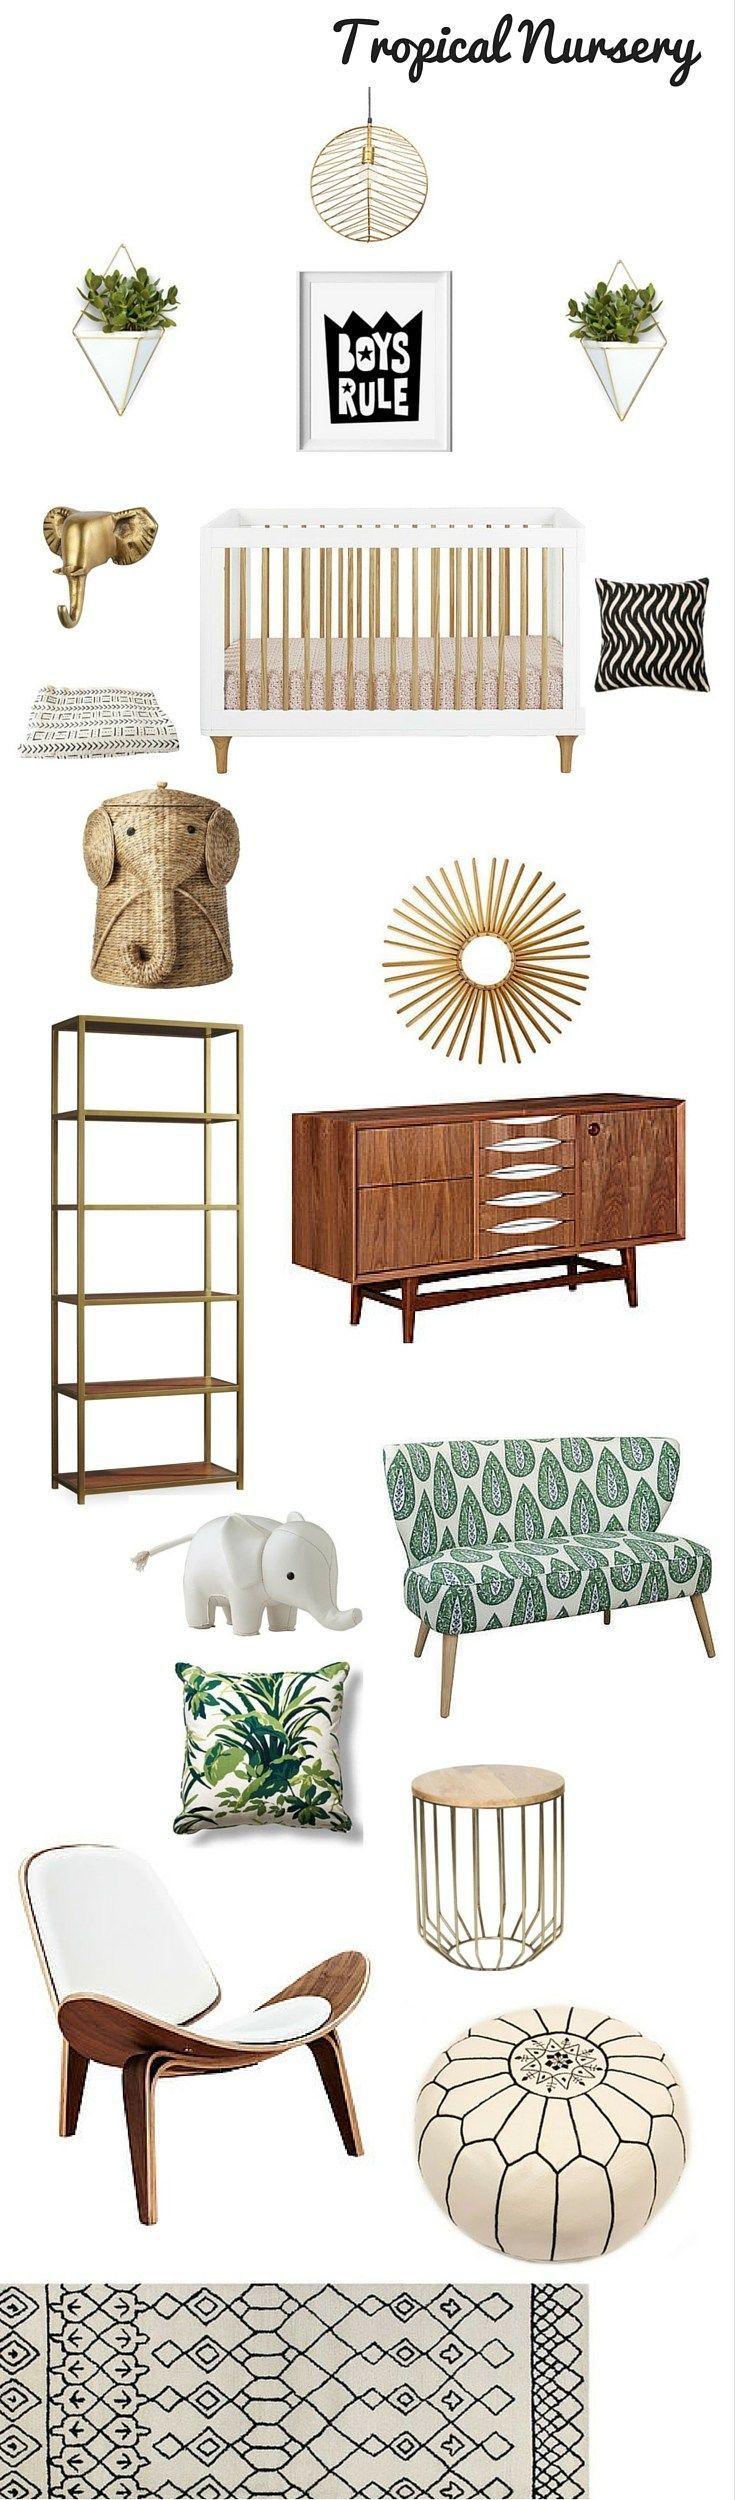 tropical nursery design / mid century modern nursery decor